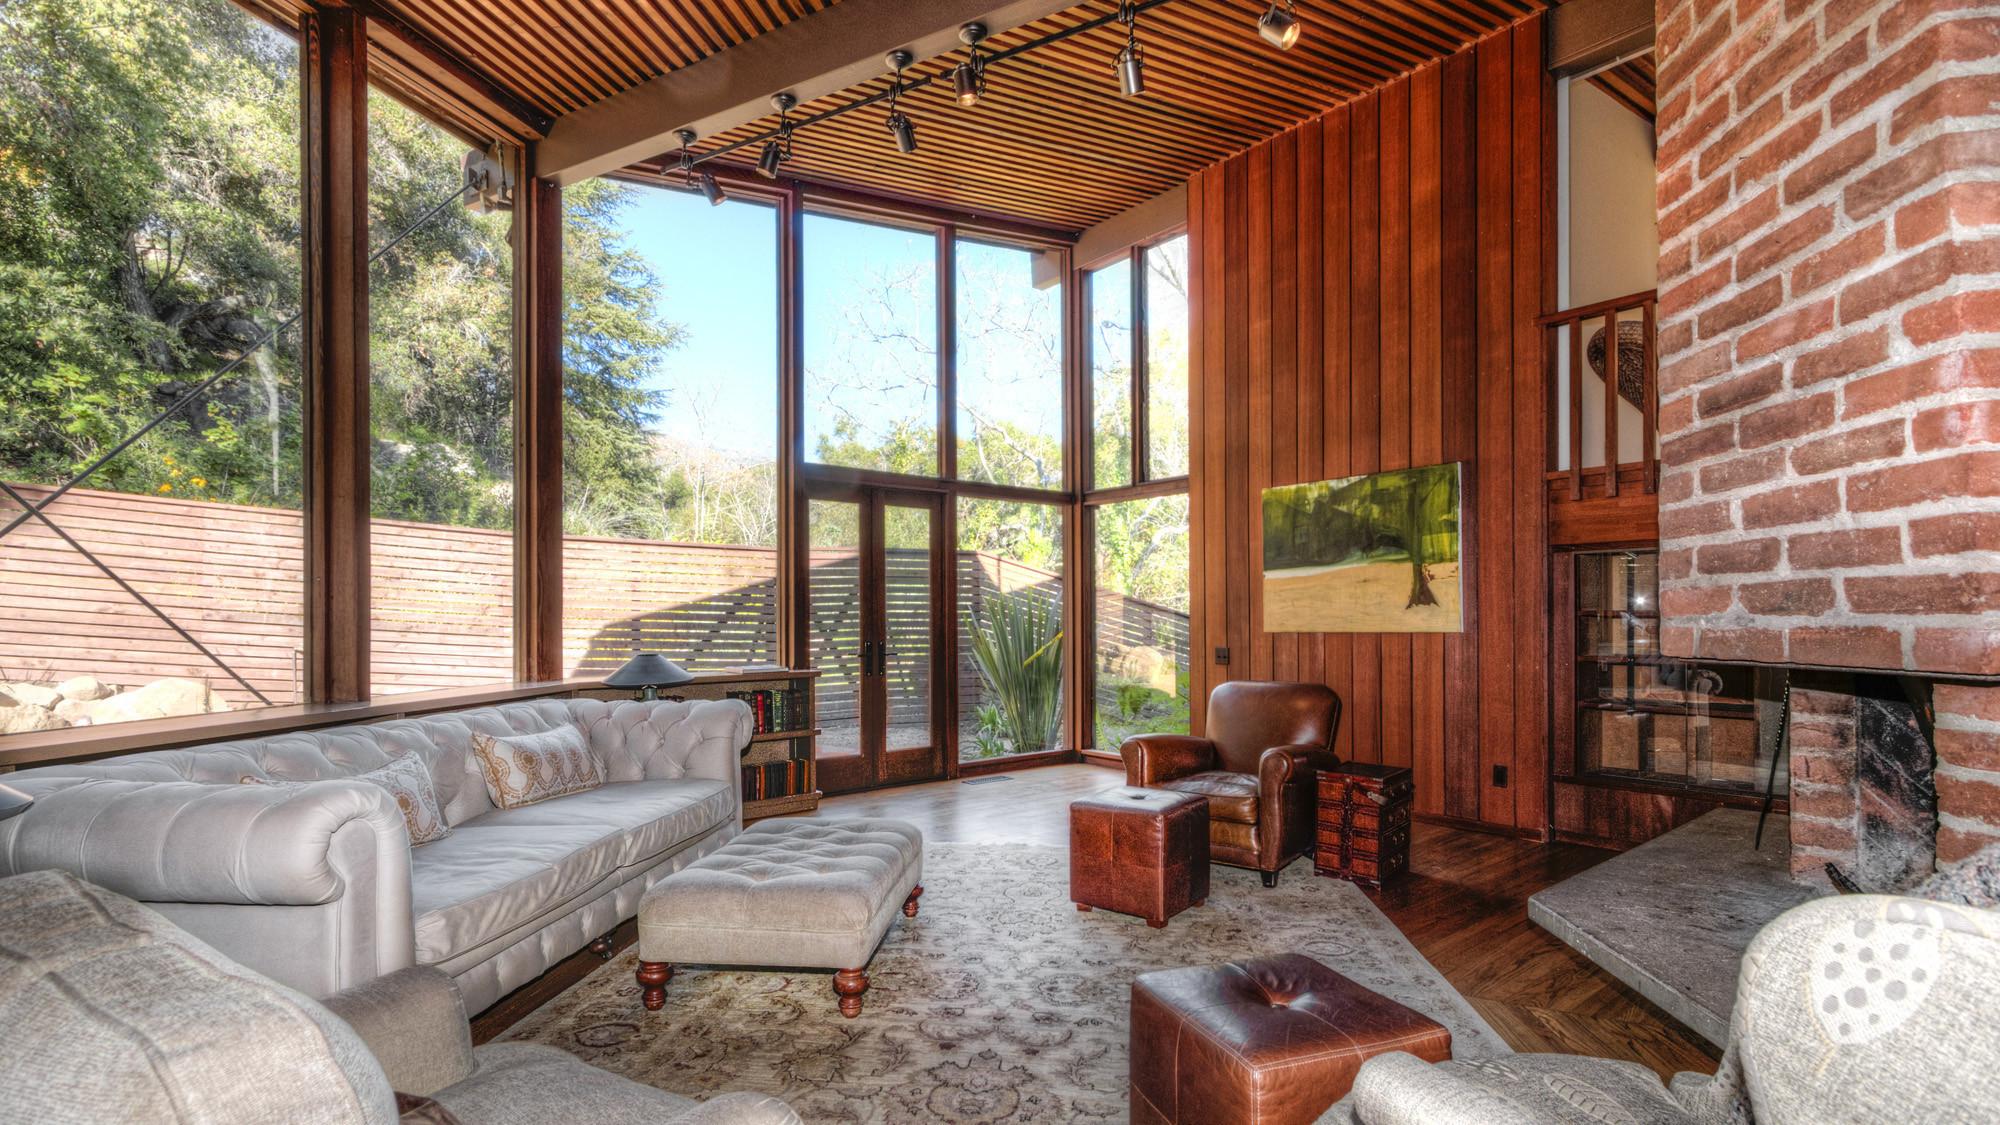 Santa Barbara Mission Floor Plan Home Of The Day Post And Beam Treehouse In Santa Barbara